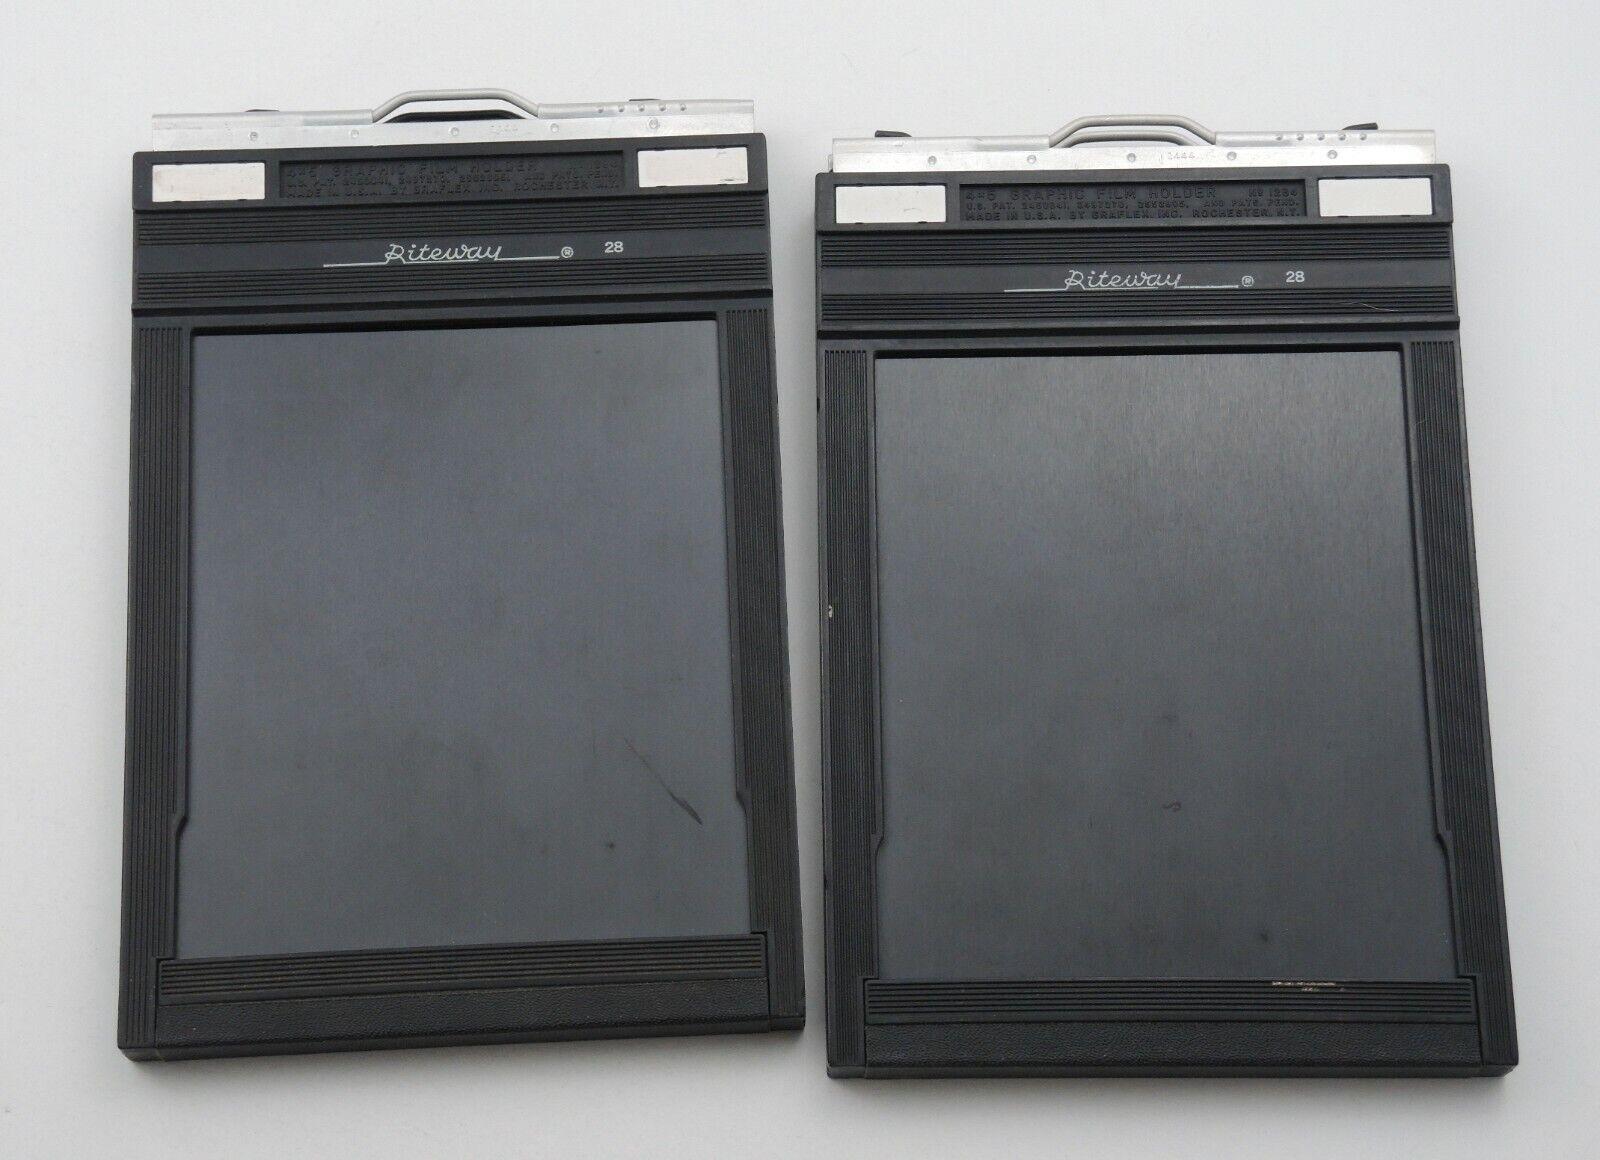 LOT Of 2 Riteway 4x5 Graphic Graflex Film Holder Holders / Cut Sheet Film NICE - $19.99